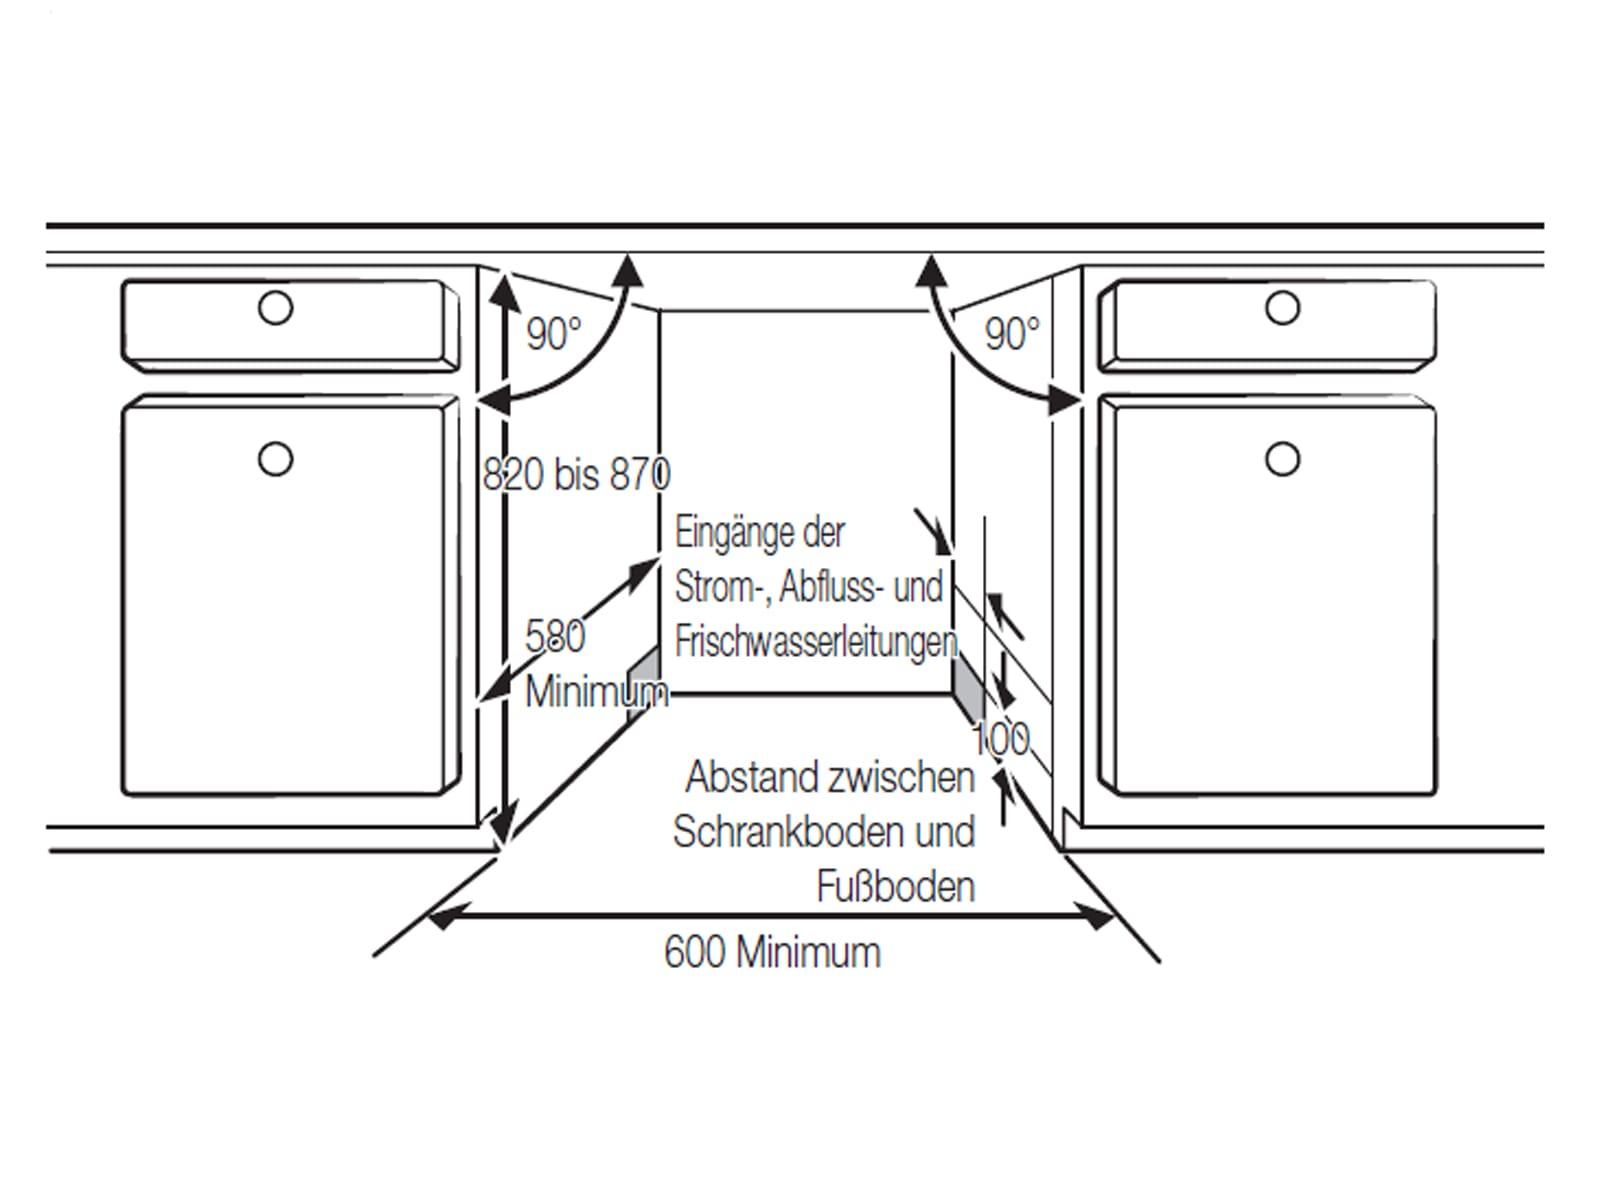 Samsung DW6KM5031BB/EG Vollintegrierbarer Einbaugeschirrspüler